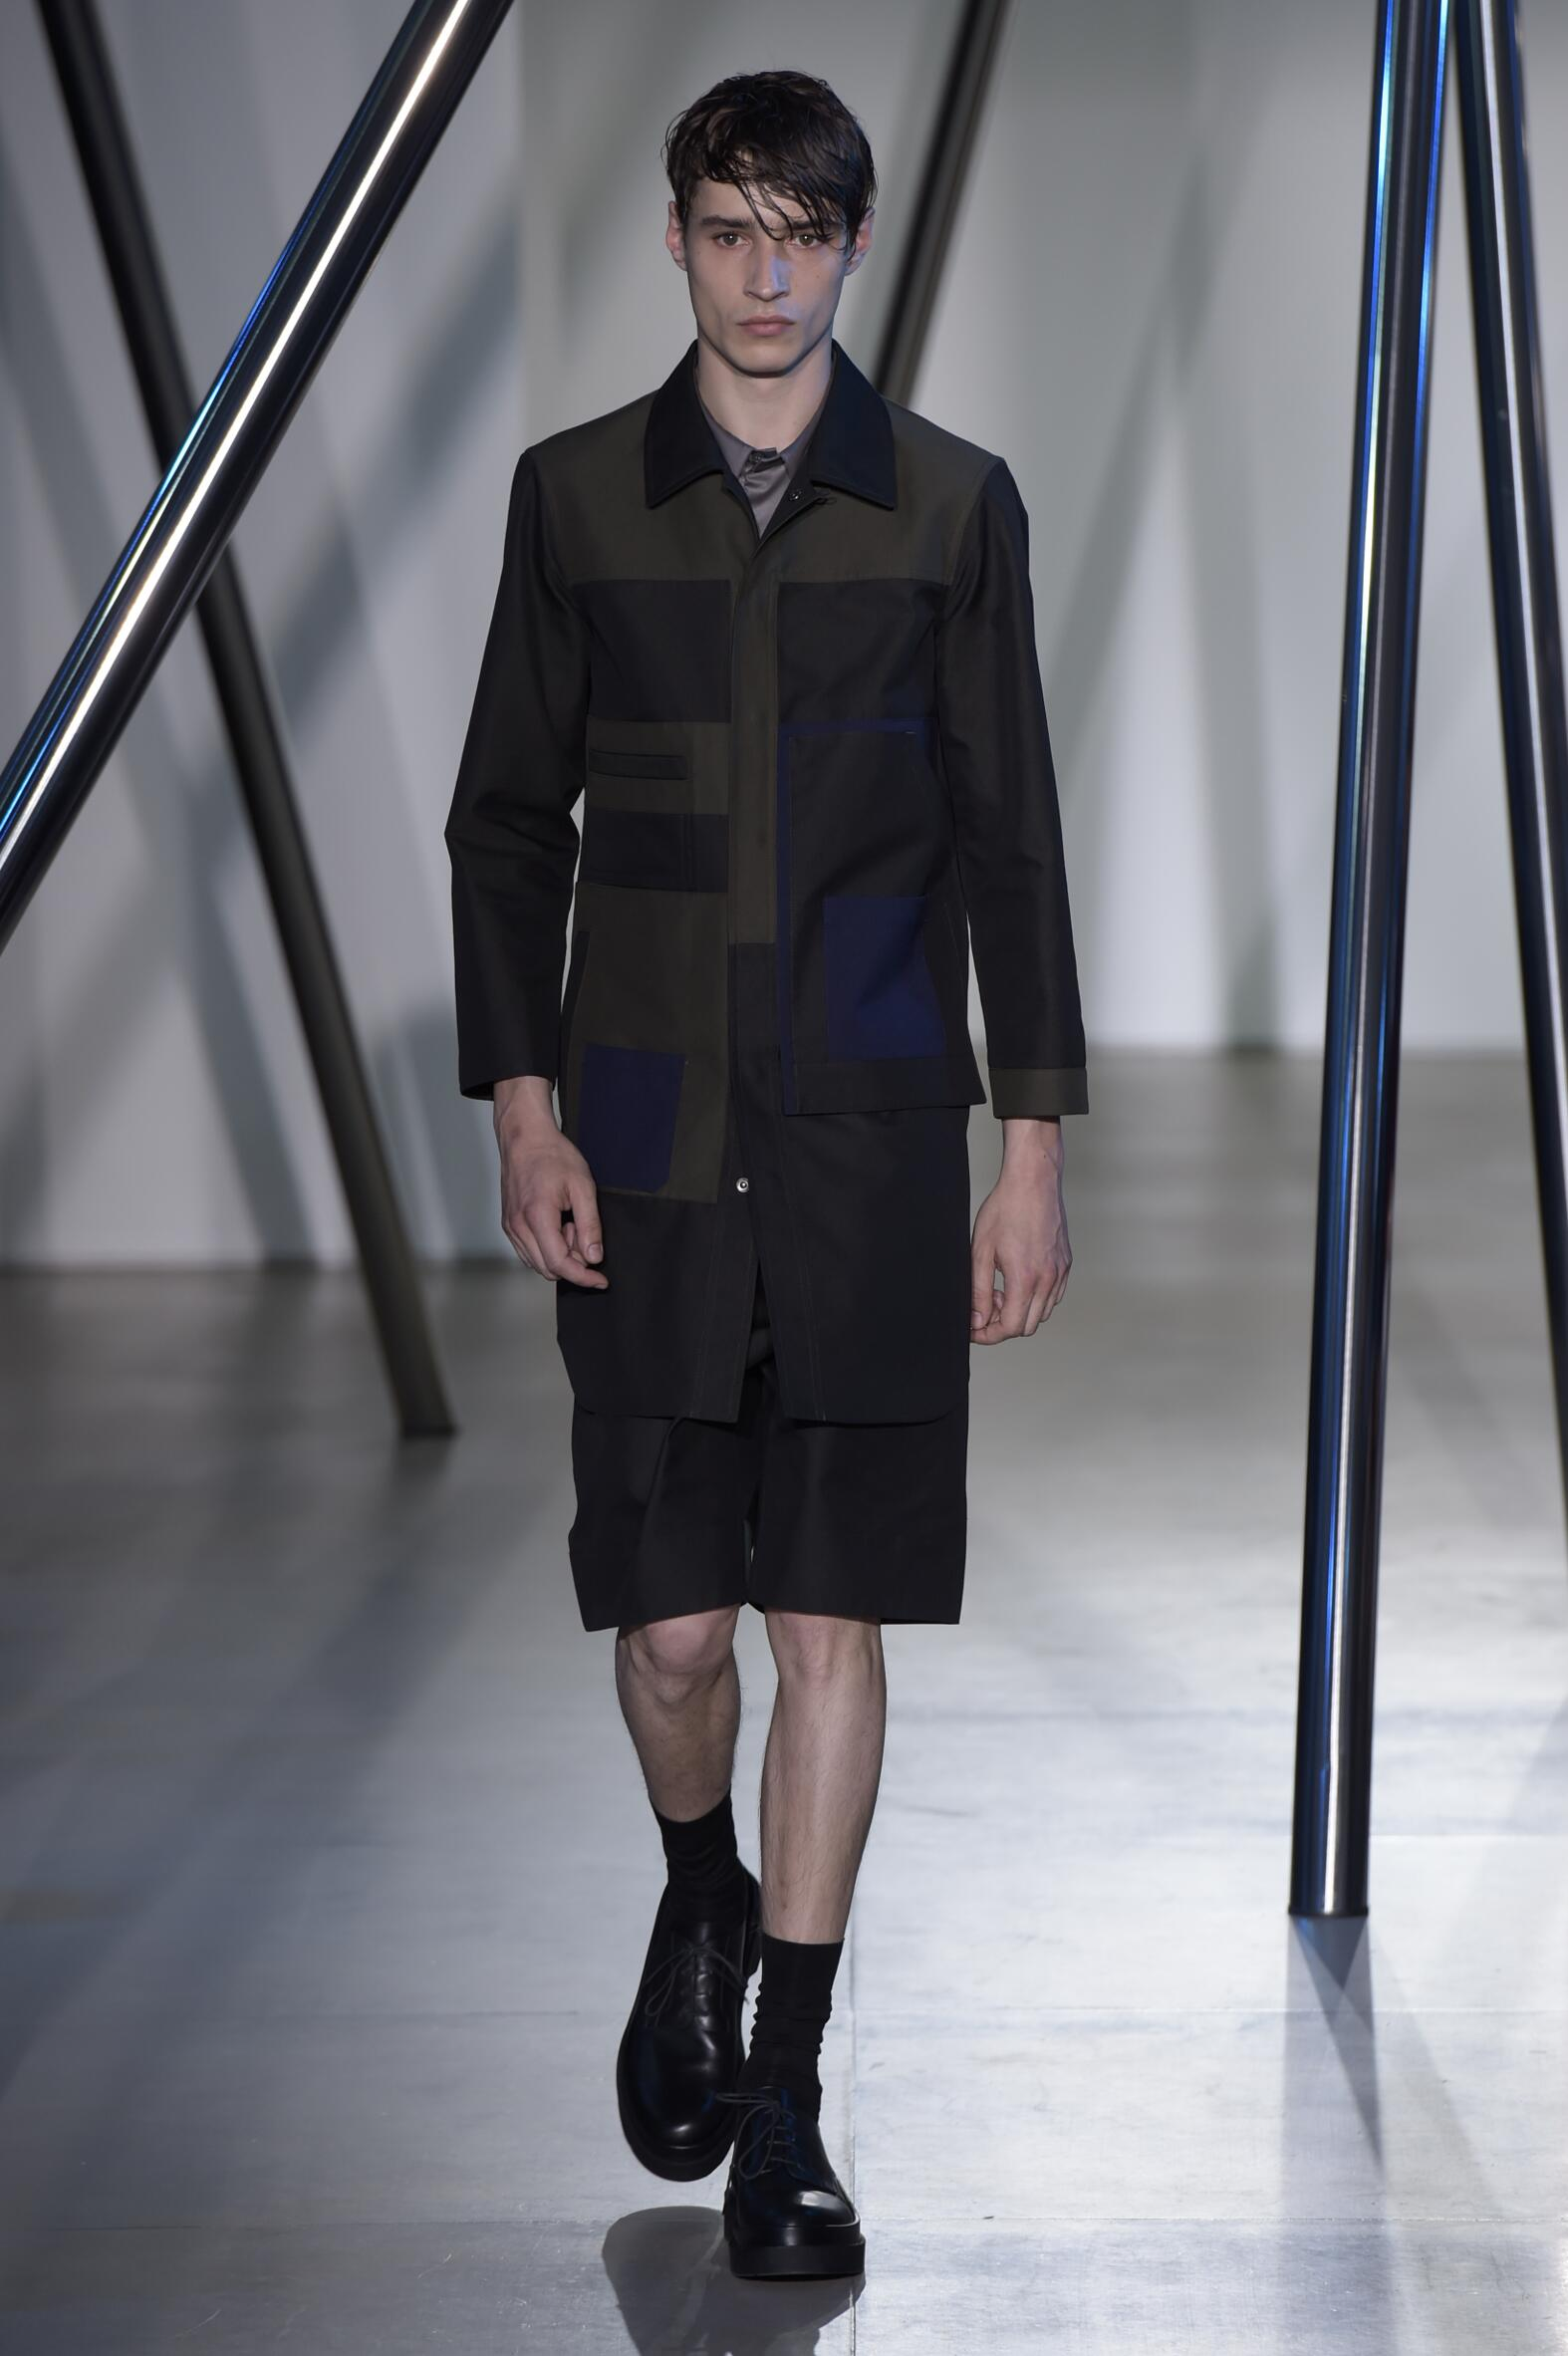 Summer 2016 Man Trends Jil Sander Collection